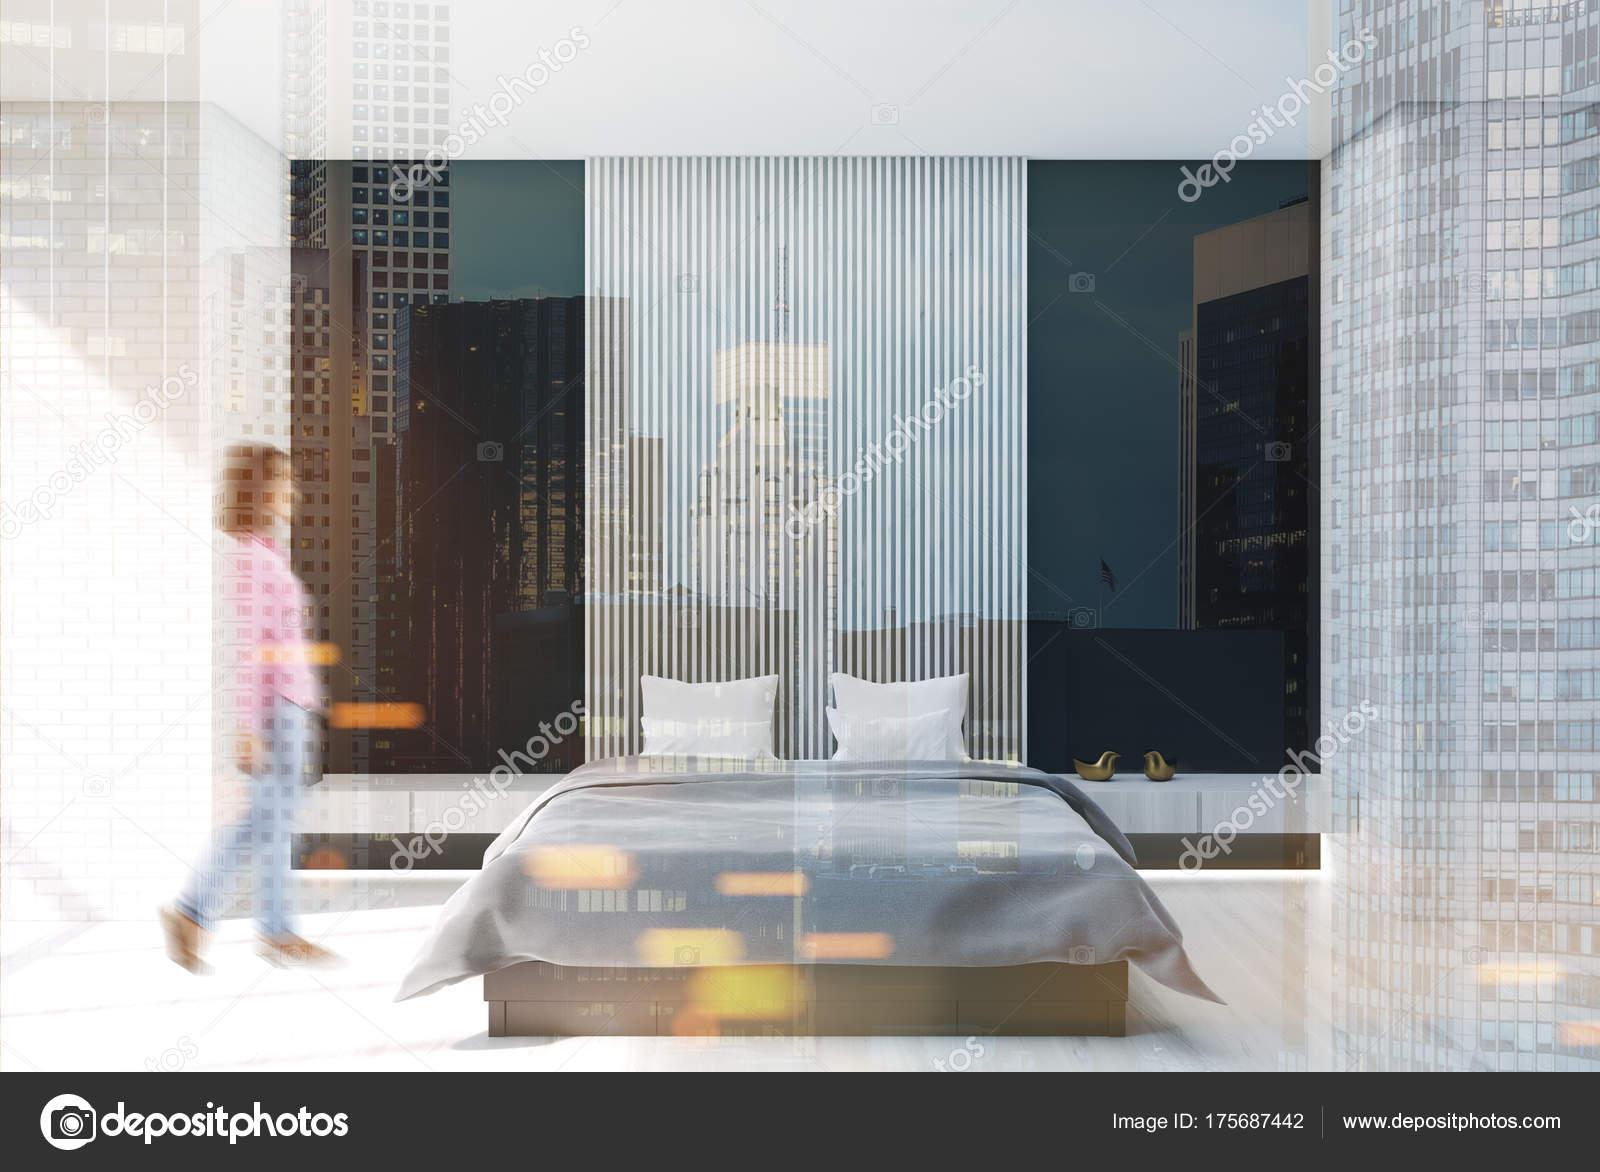 Slaapkamer Zwarte Vloer : Wit zwart en houten slaapkamer poster toned u stockfoto